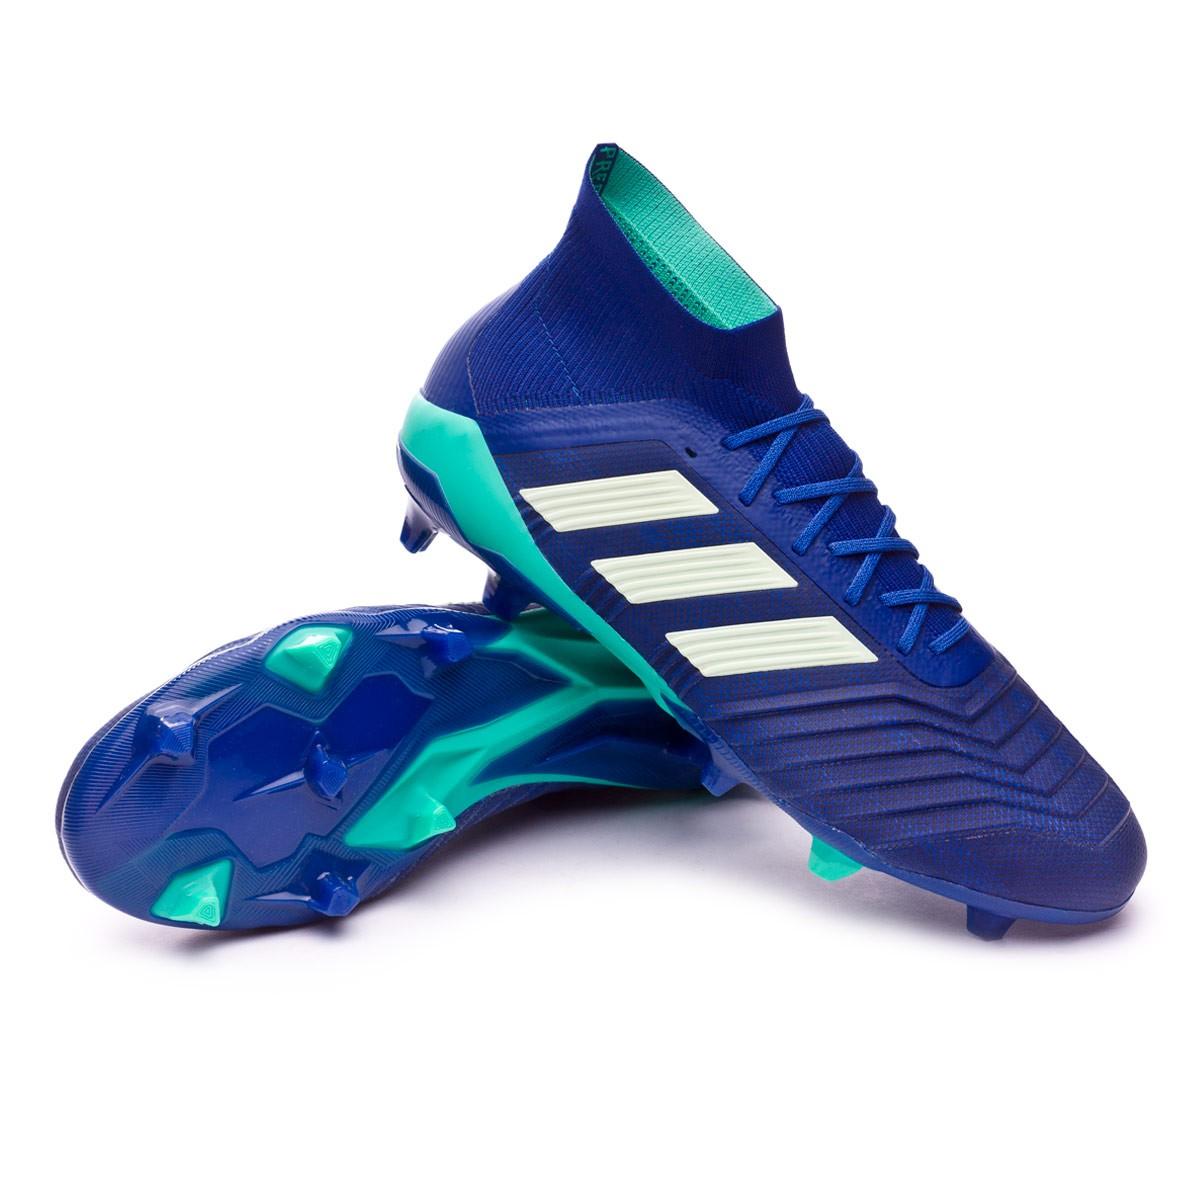 ffa813b3a adidas Predator 18.1 FG Football Boots. Unity ink-Aero green-Hi-res ...